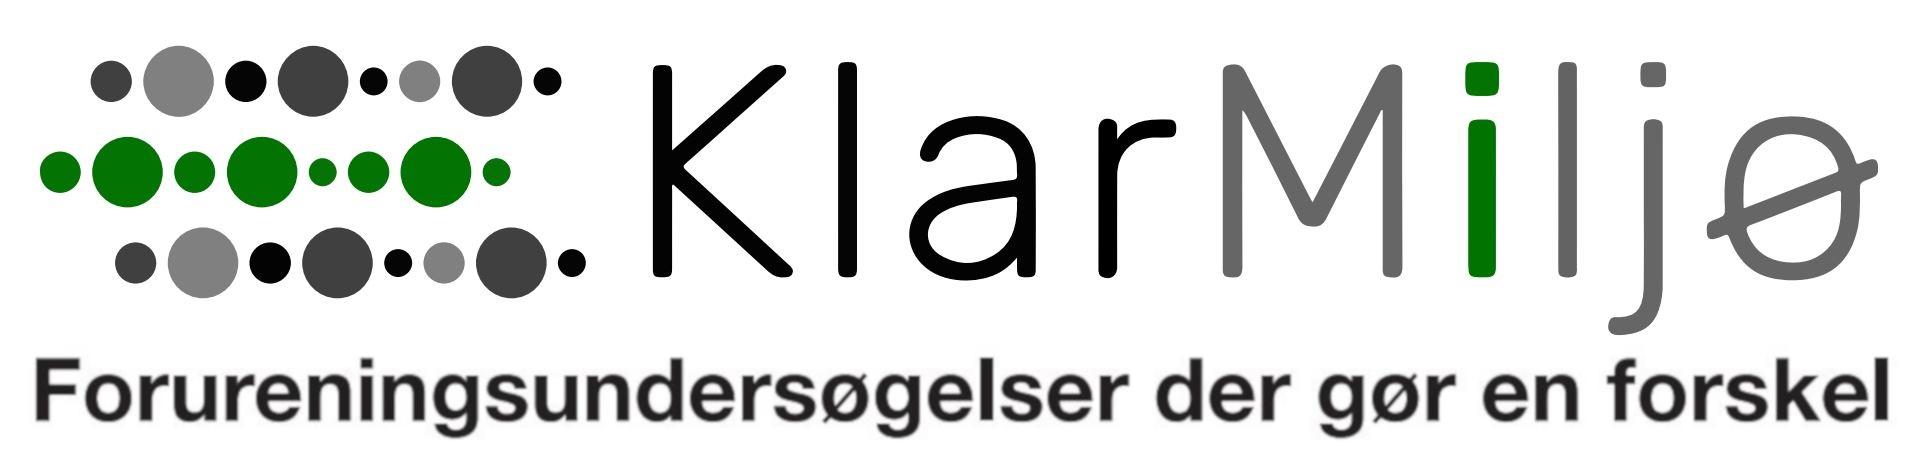 KlarMiljø.dk